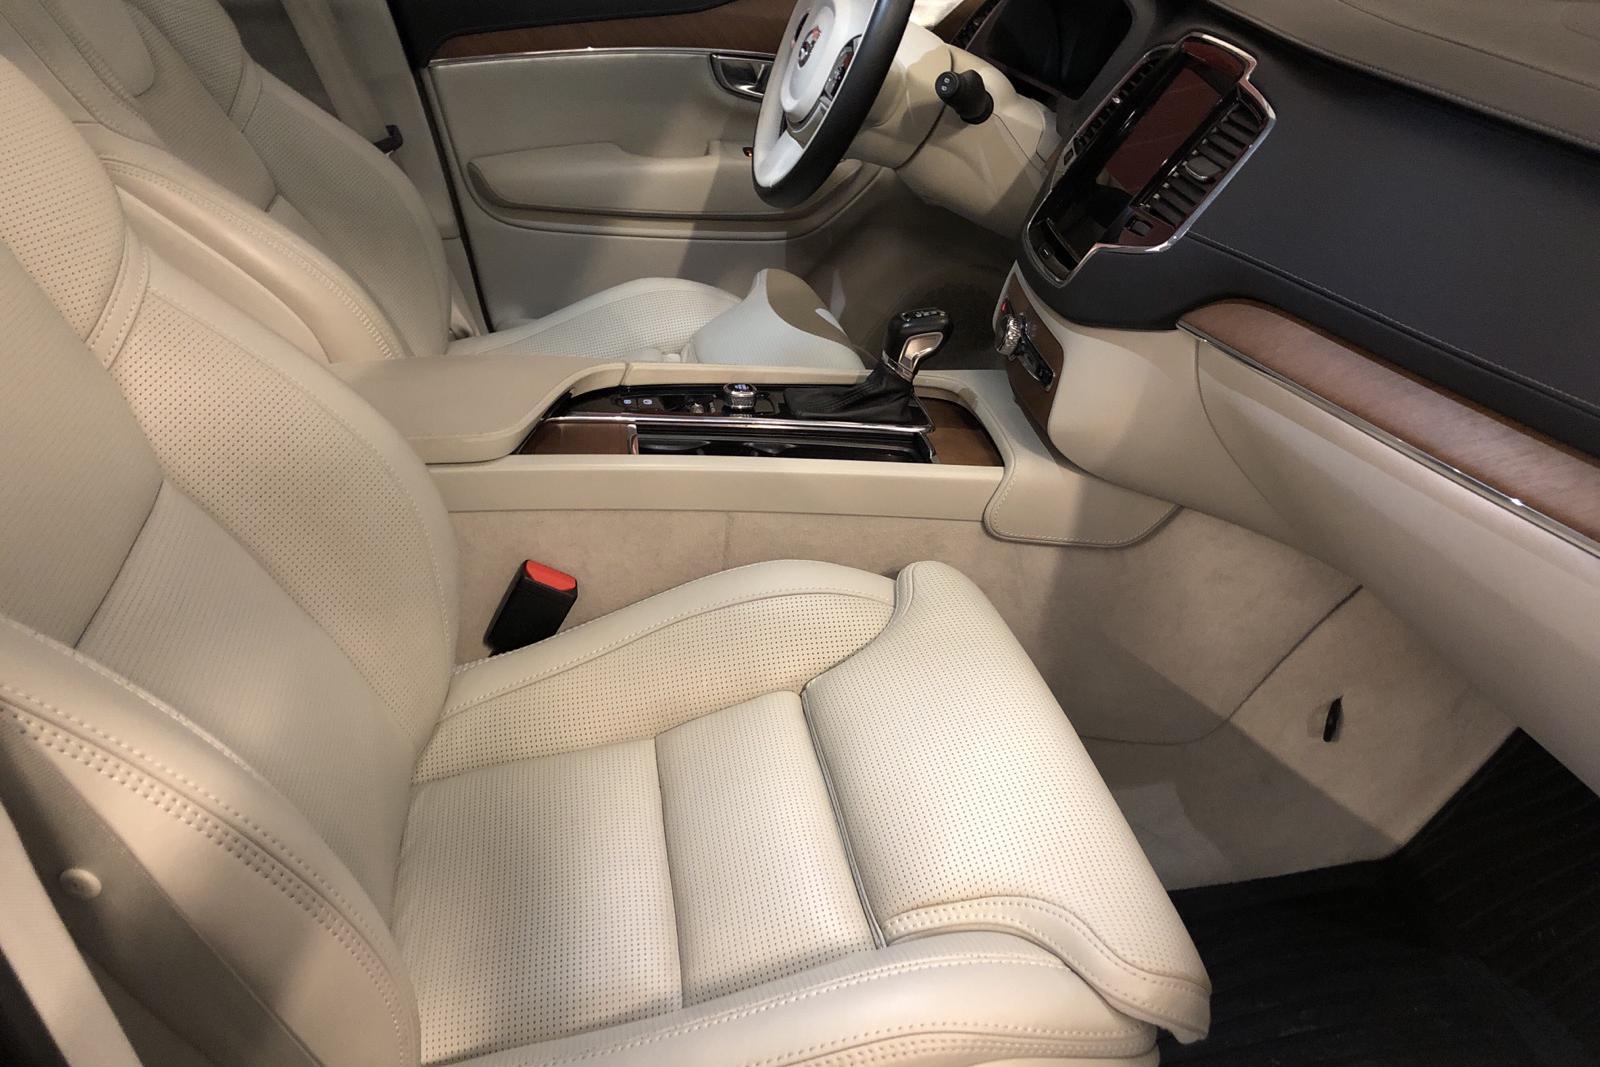 Volvo XC90 D5 AWD (235hk) - 8 481 mil - Automat - Light Brown - 2018